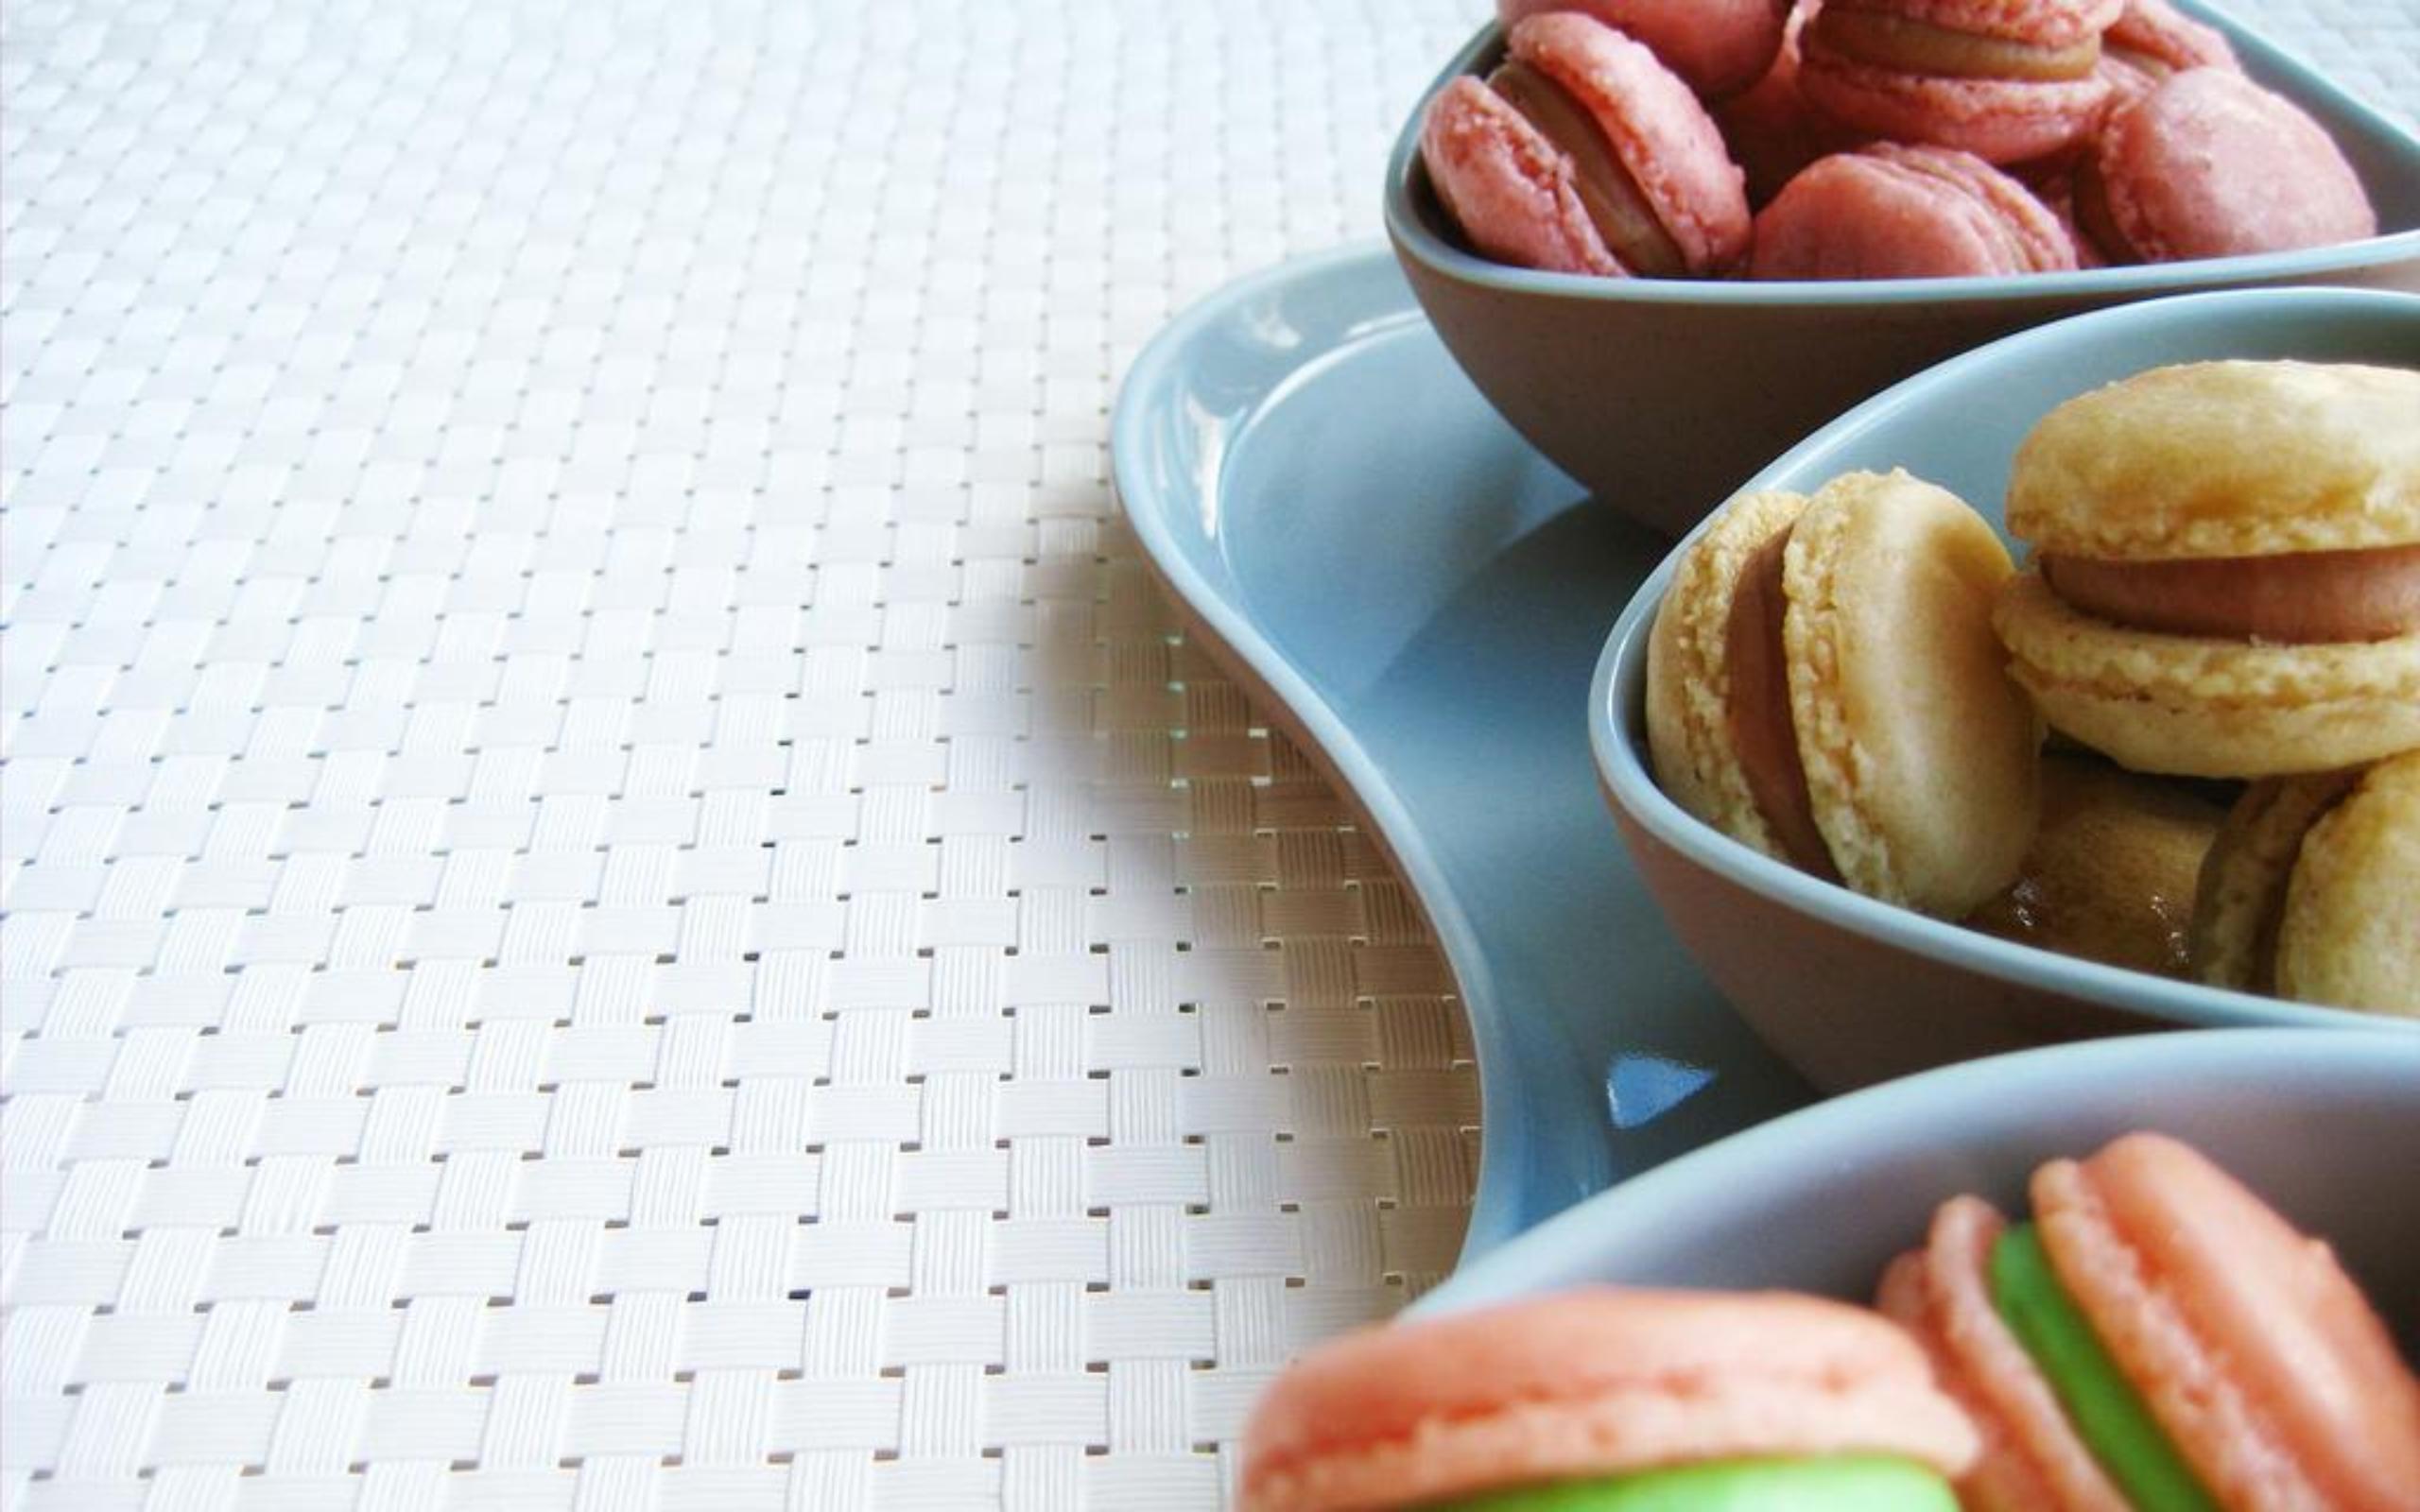 Alimento - Macaron  Sfondo